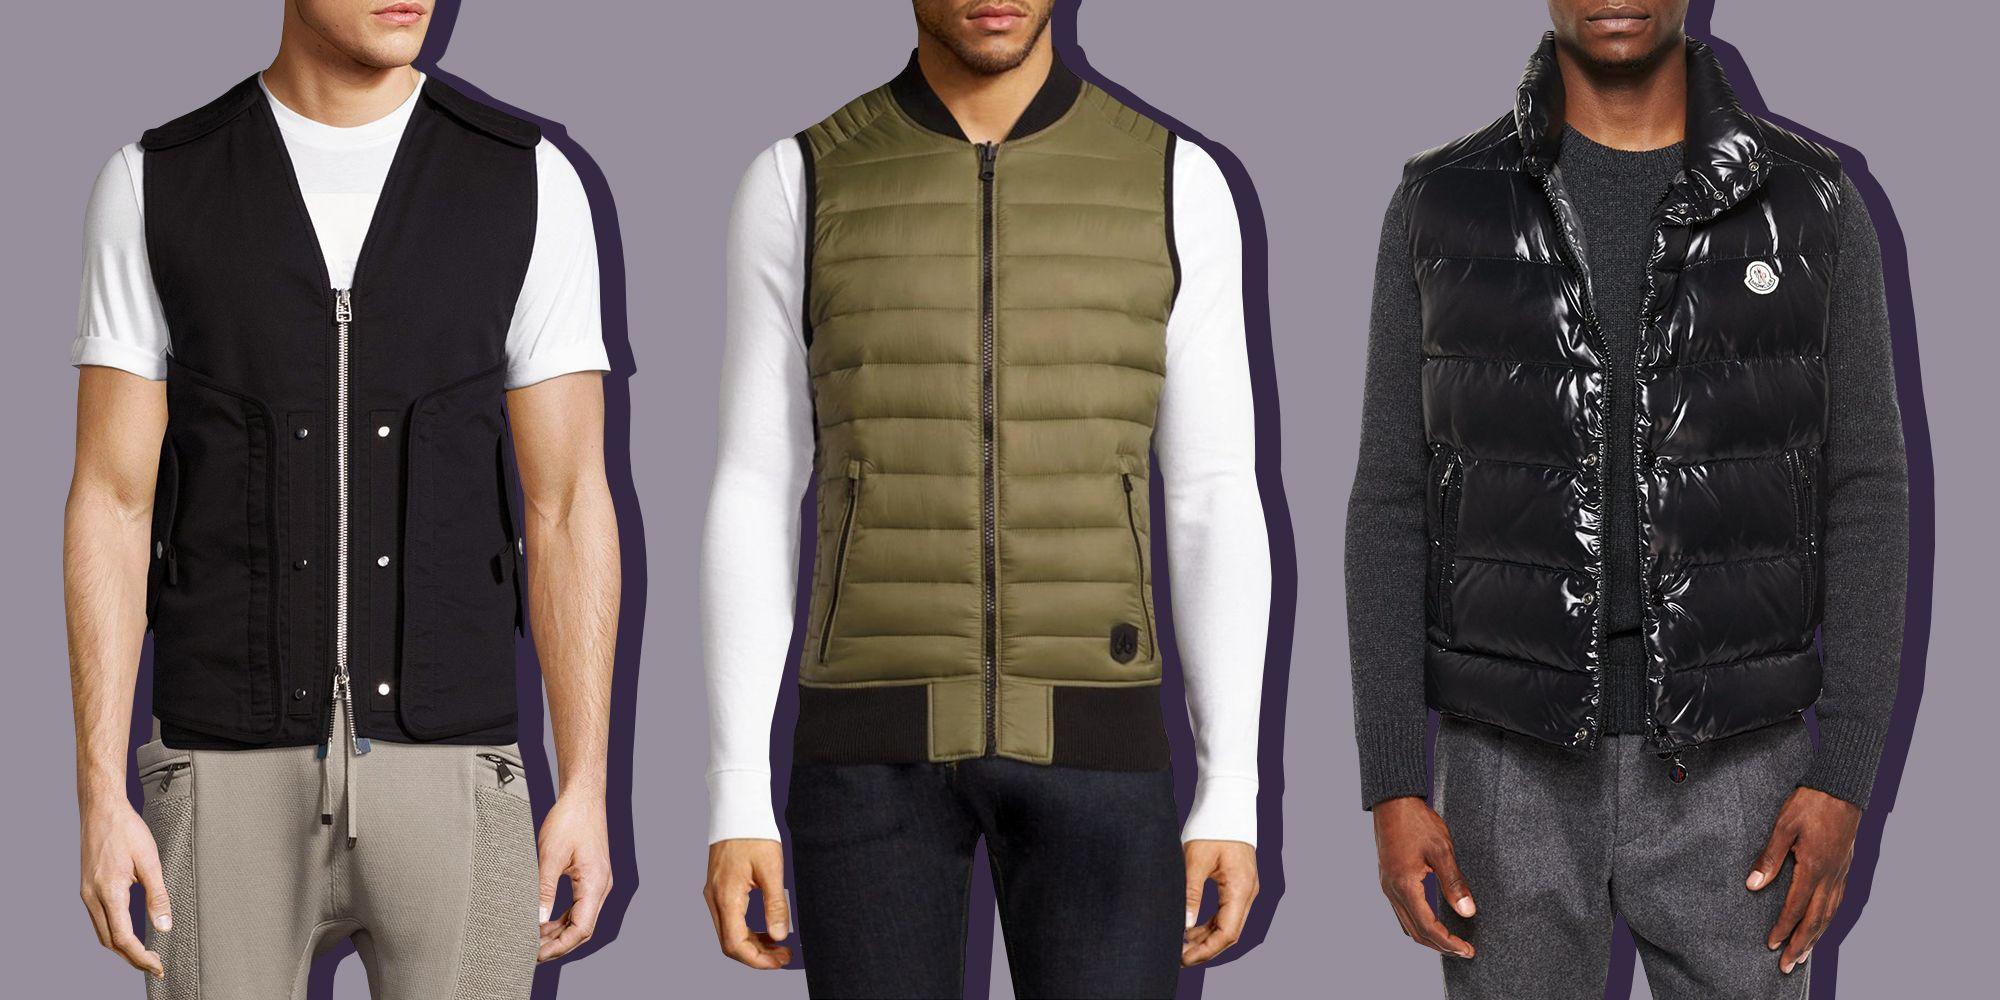 8 Best Men's Vests for Fall 2018 - Shell, Puffer, and Fleece Vests for Men